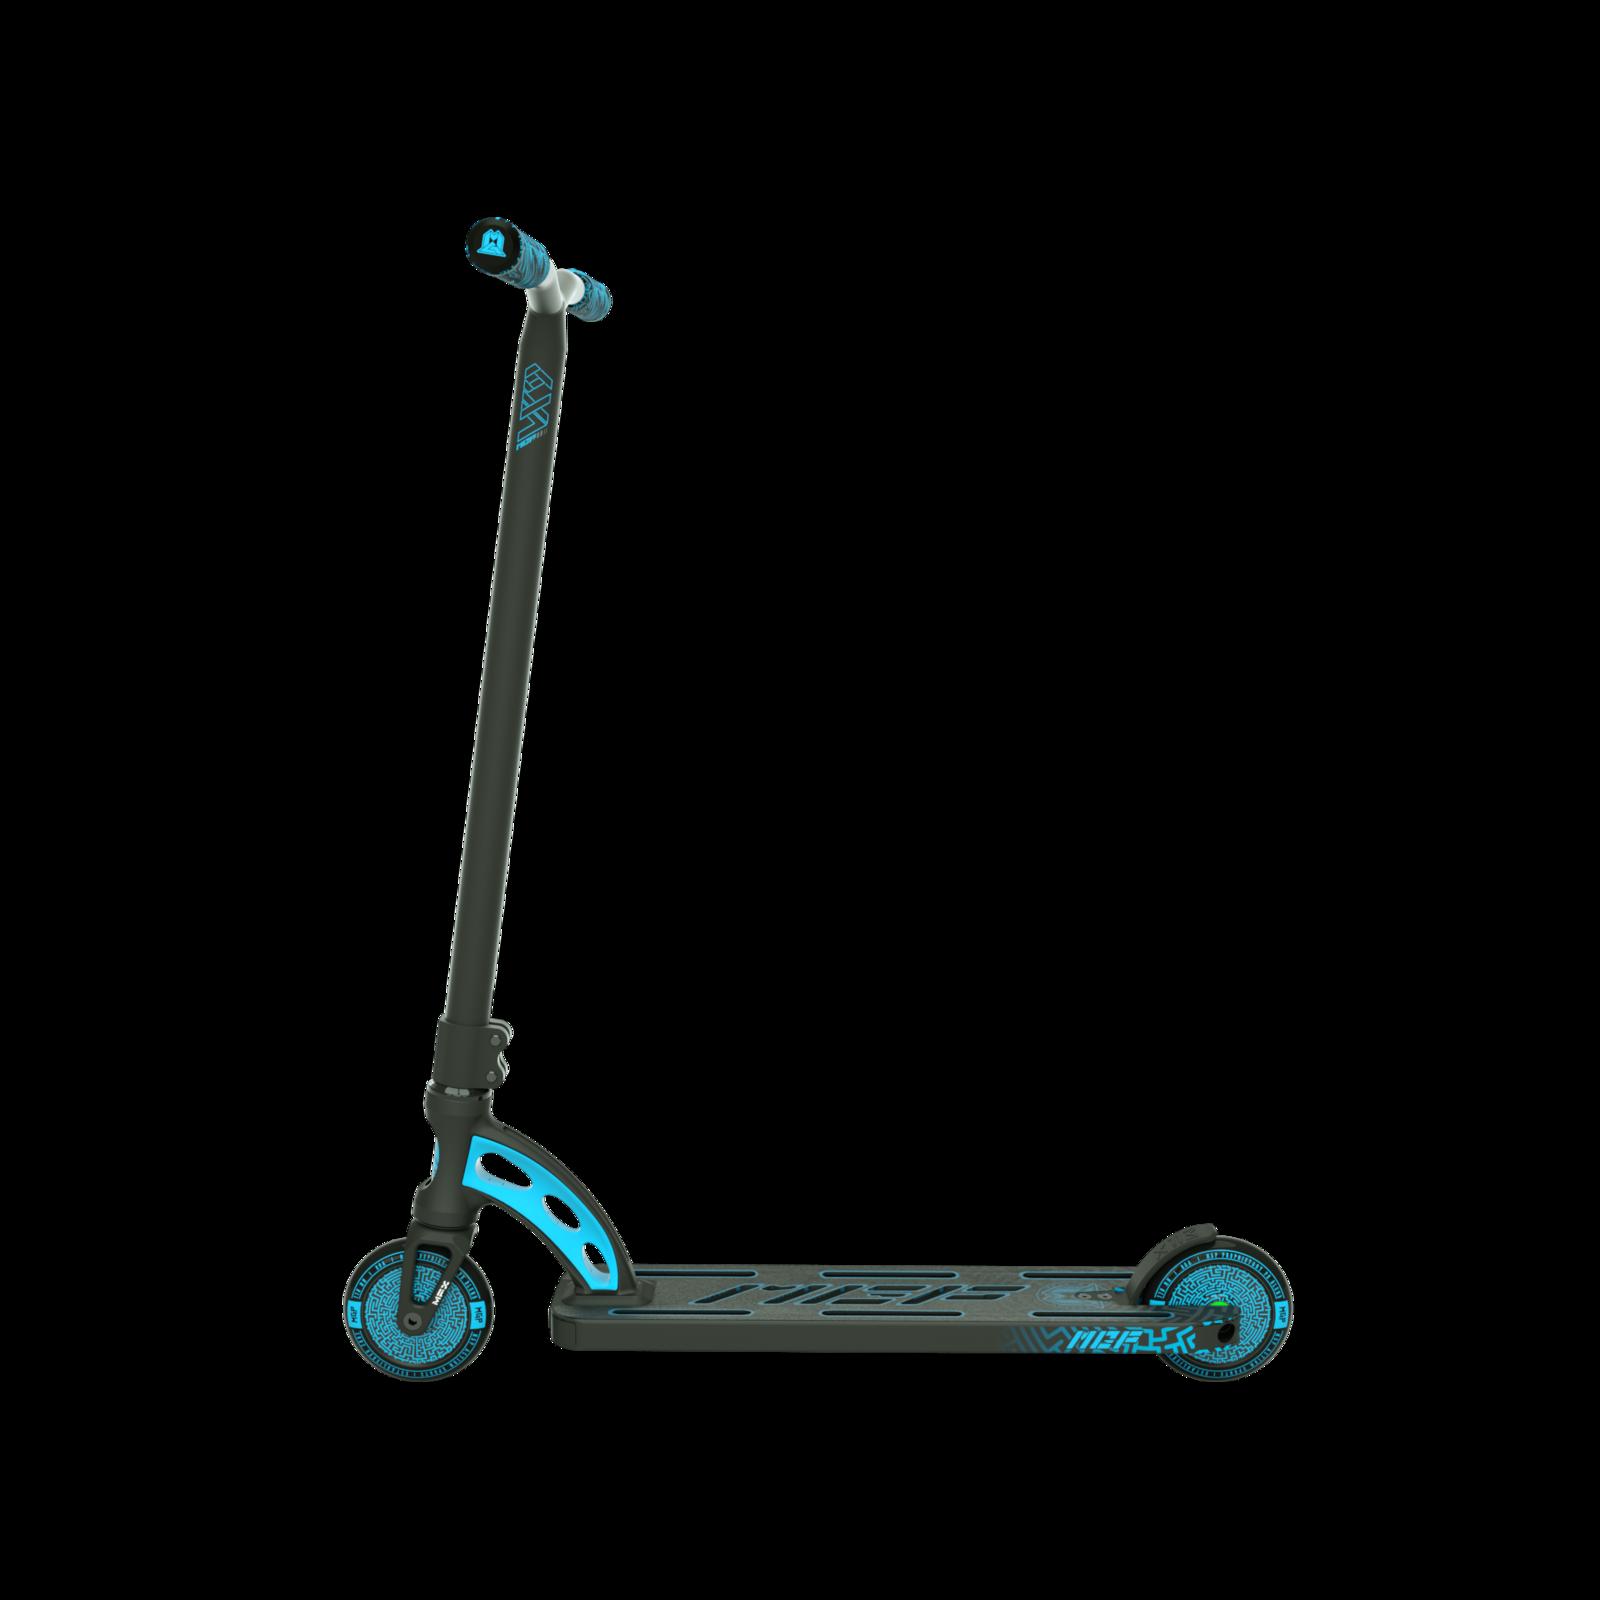 MADD Gear: VX9 Pro Scooter - Black/Blue image